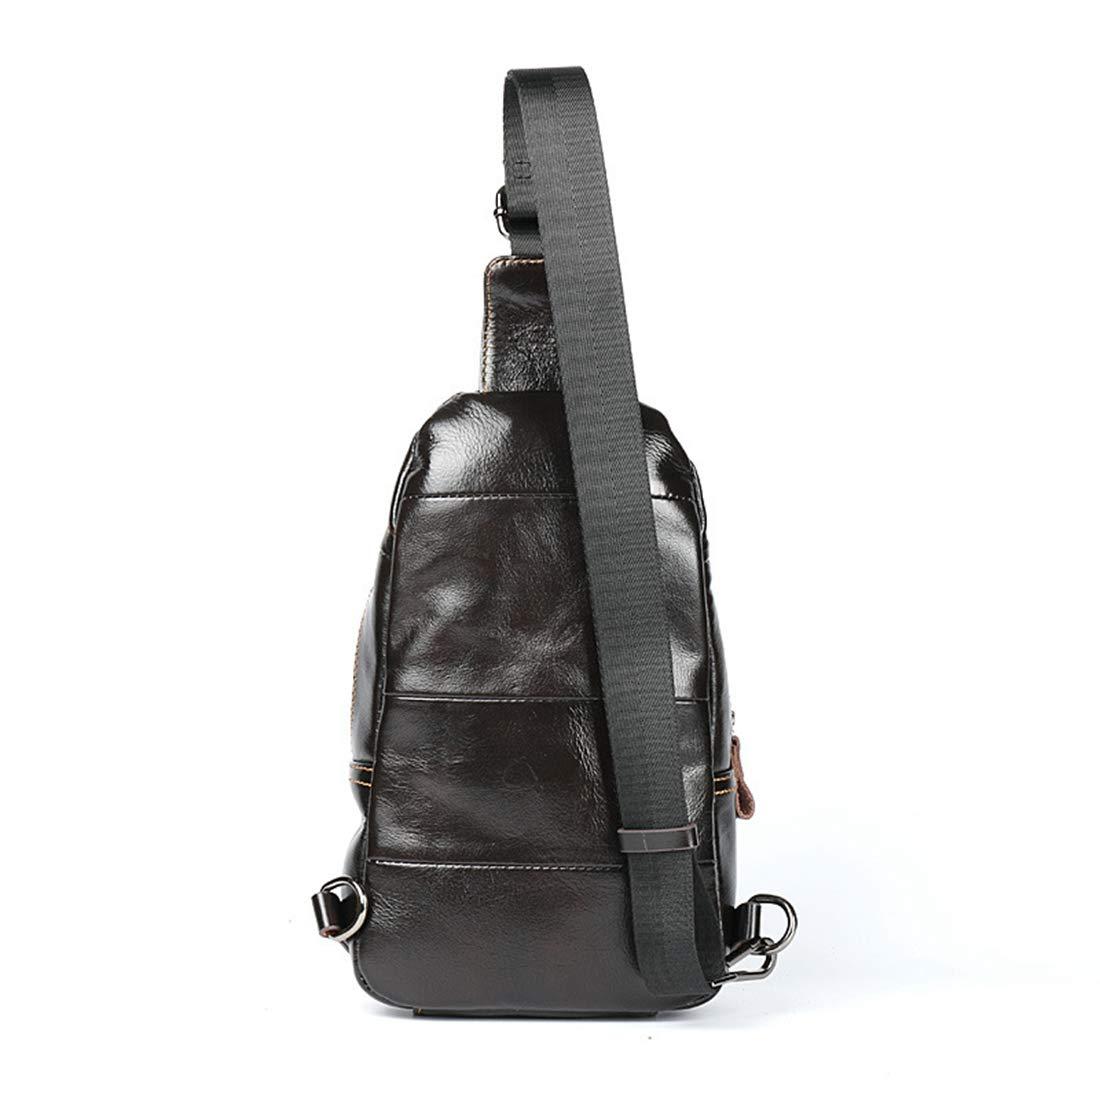 RABILTY Men Chest Bag Genuine Leather Business Leisure One Shoulder Crossbody Bag Satchel Work Out Travel Bag Color : Red-Brown